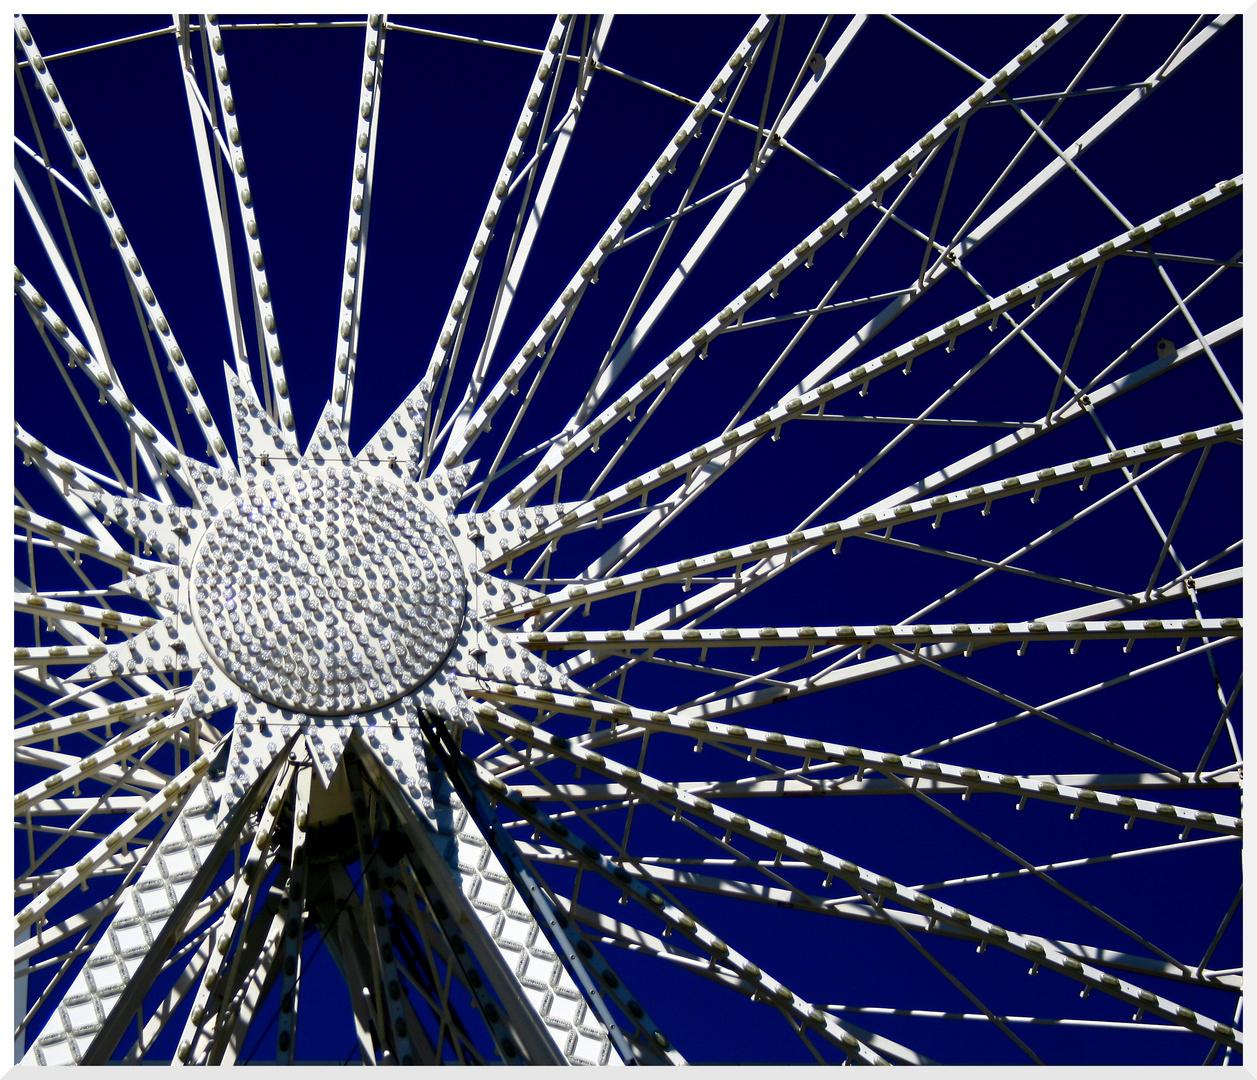 Riesenrad Blau/Weiß